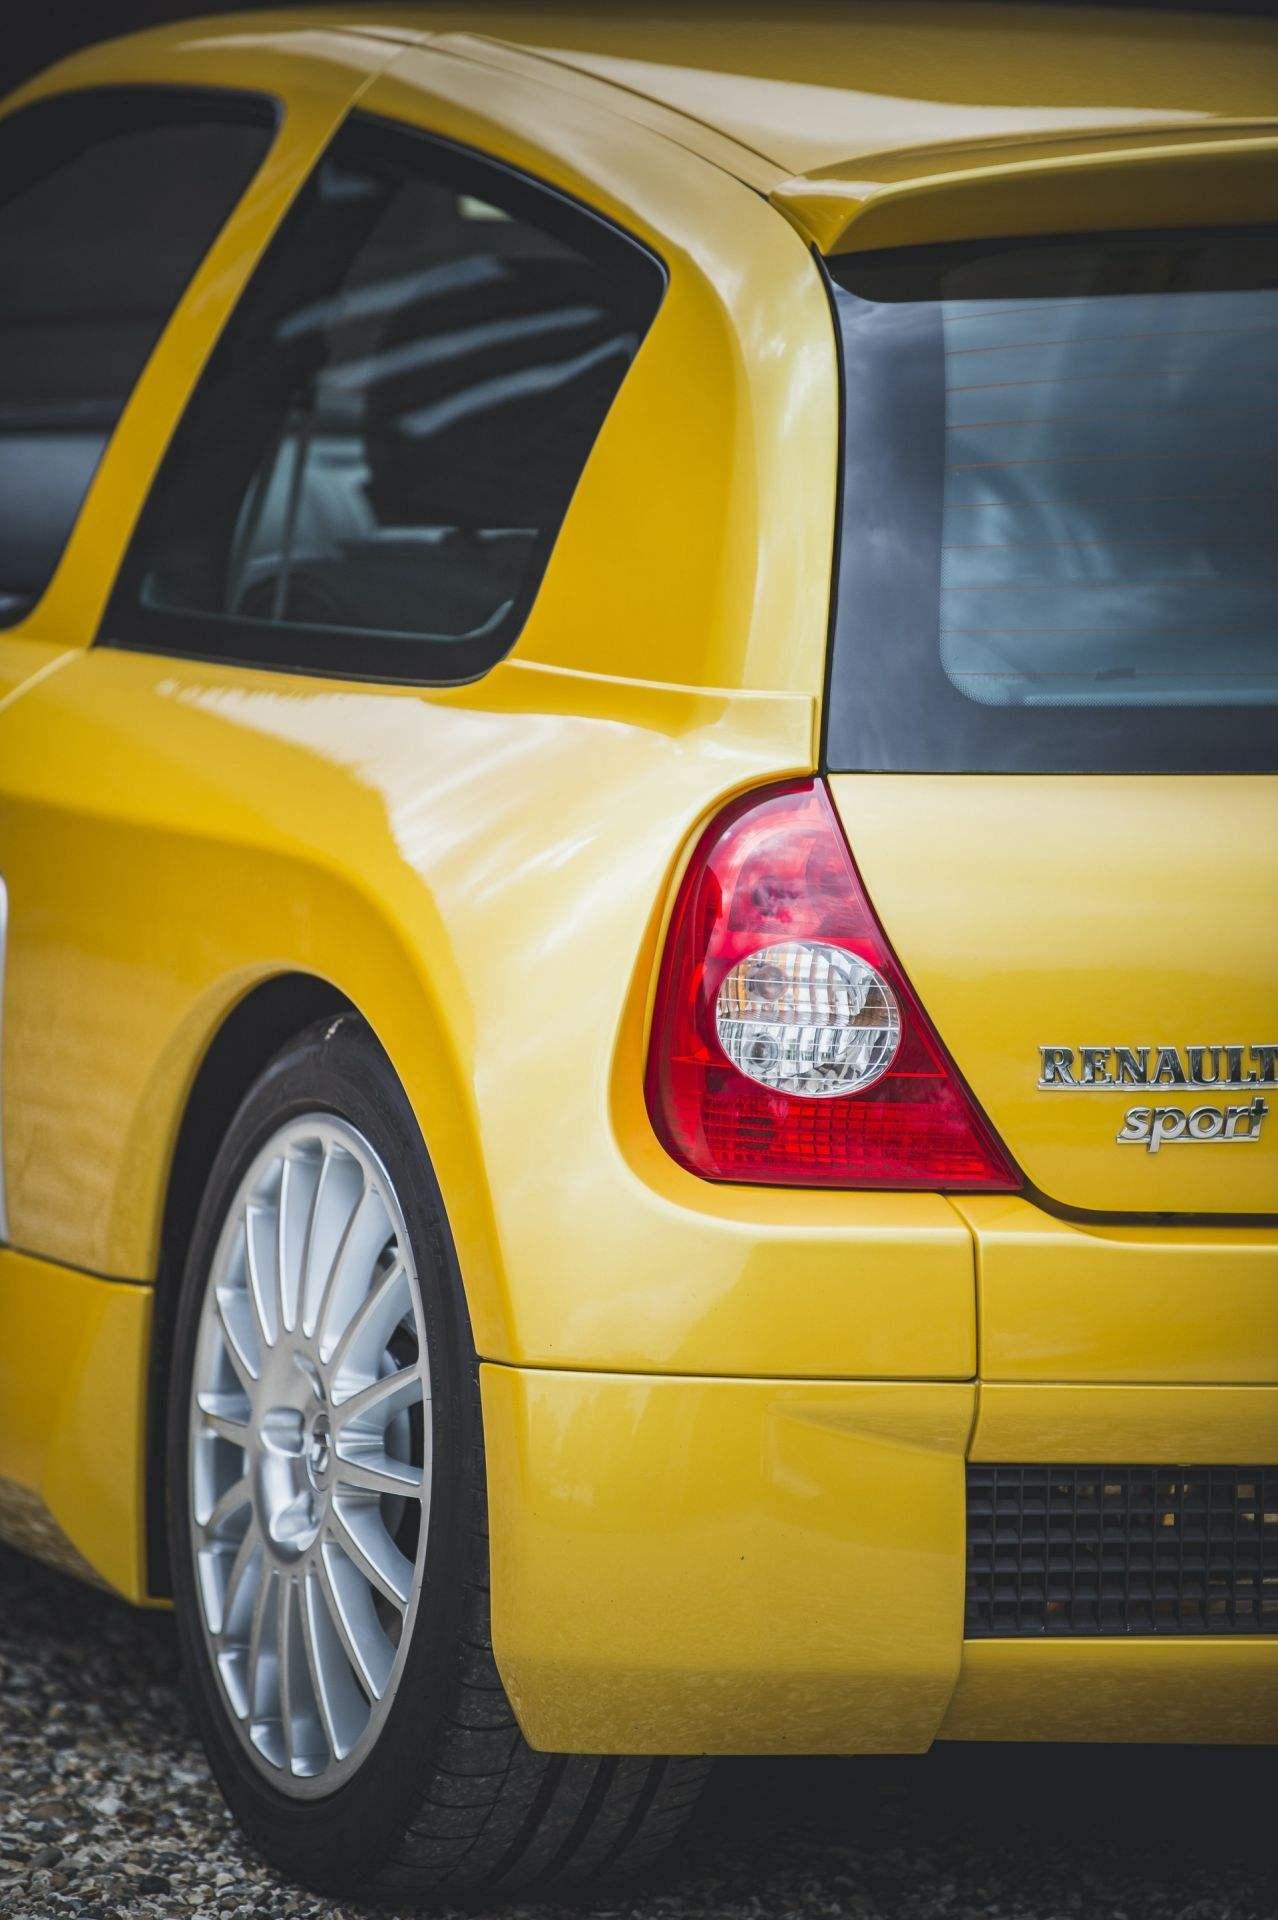 2005_Renault_Clio_V6_Phase_2_0024